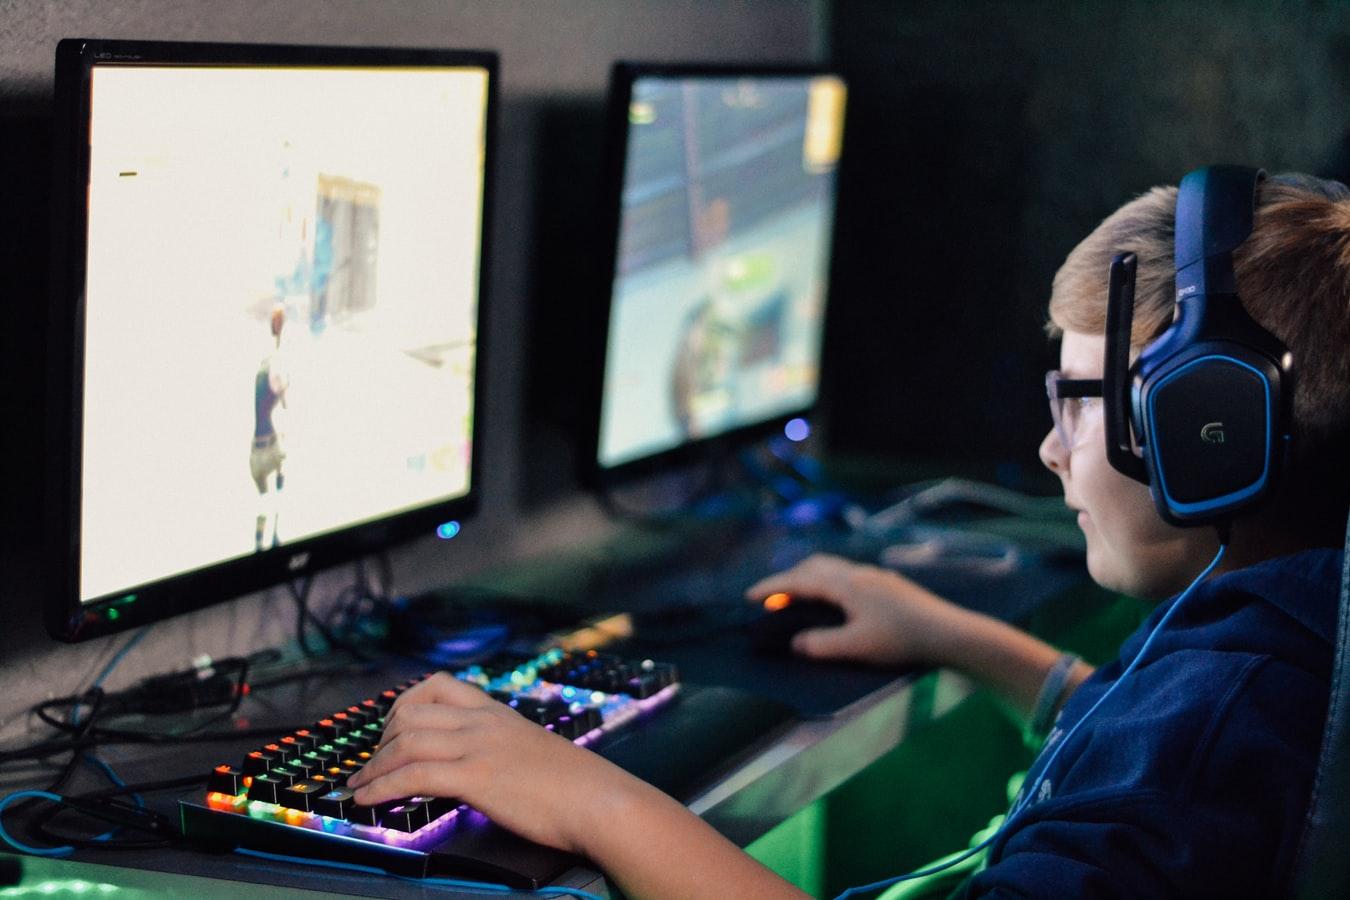 Fortnite: Μαύρη τρύπα «εξαφάνισε» το παιχνίδι – Πανικός στα social media